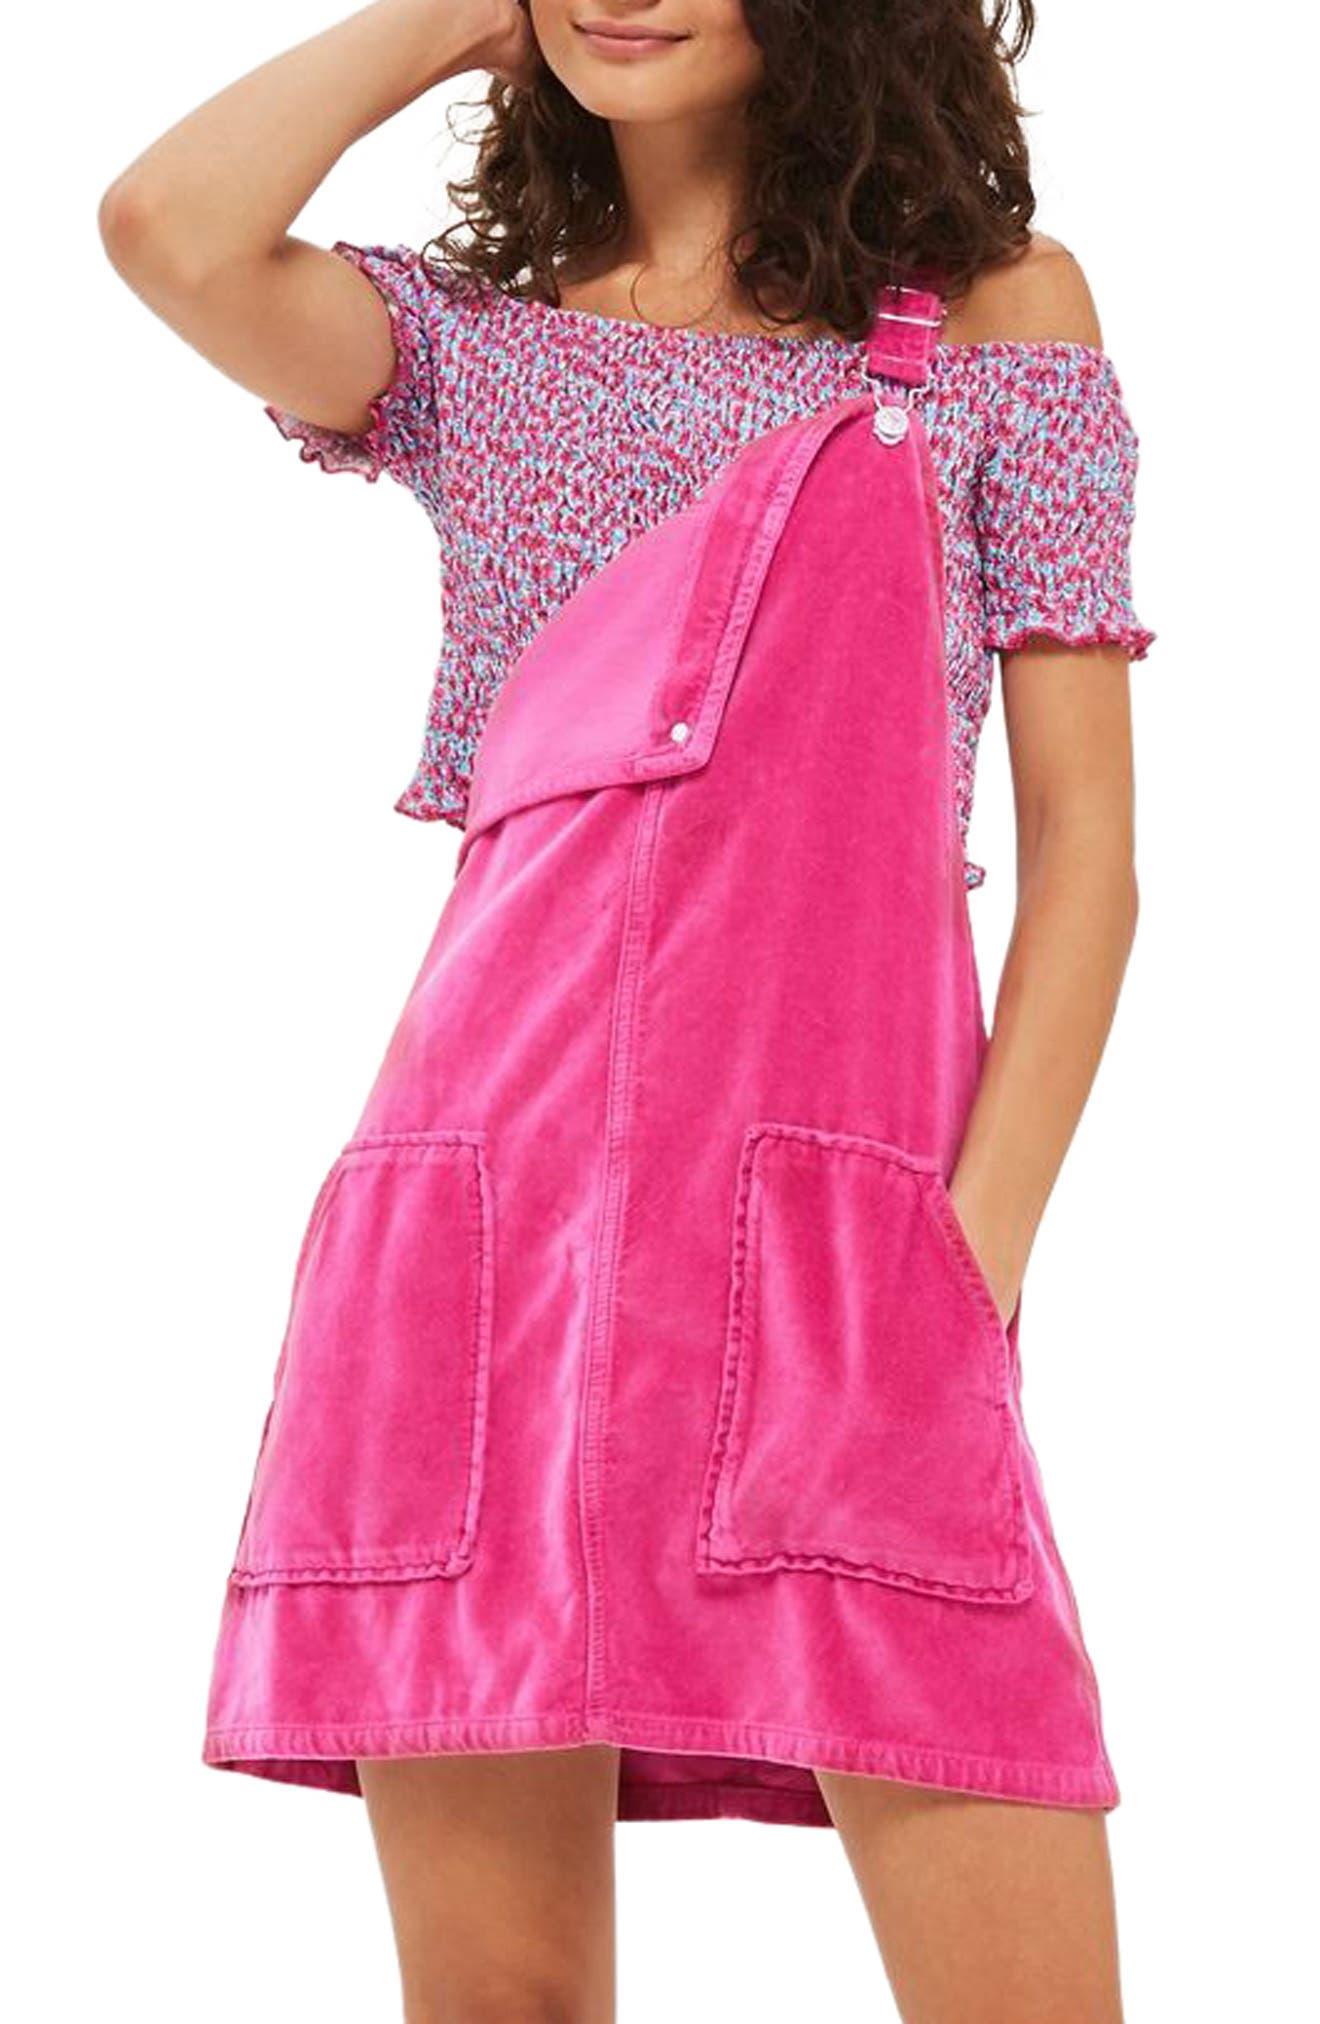 Alternate Image 1 Selected - Topshop Velvet Pinafore Dress